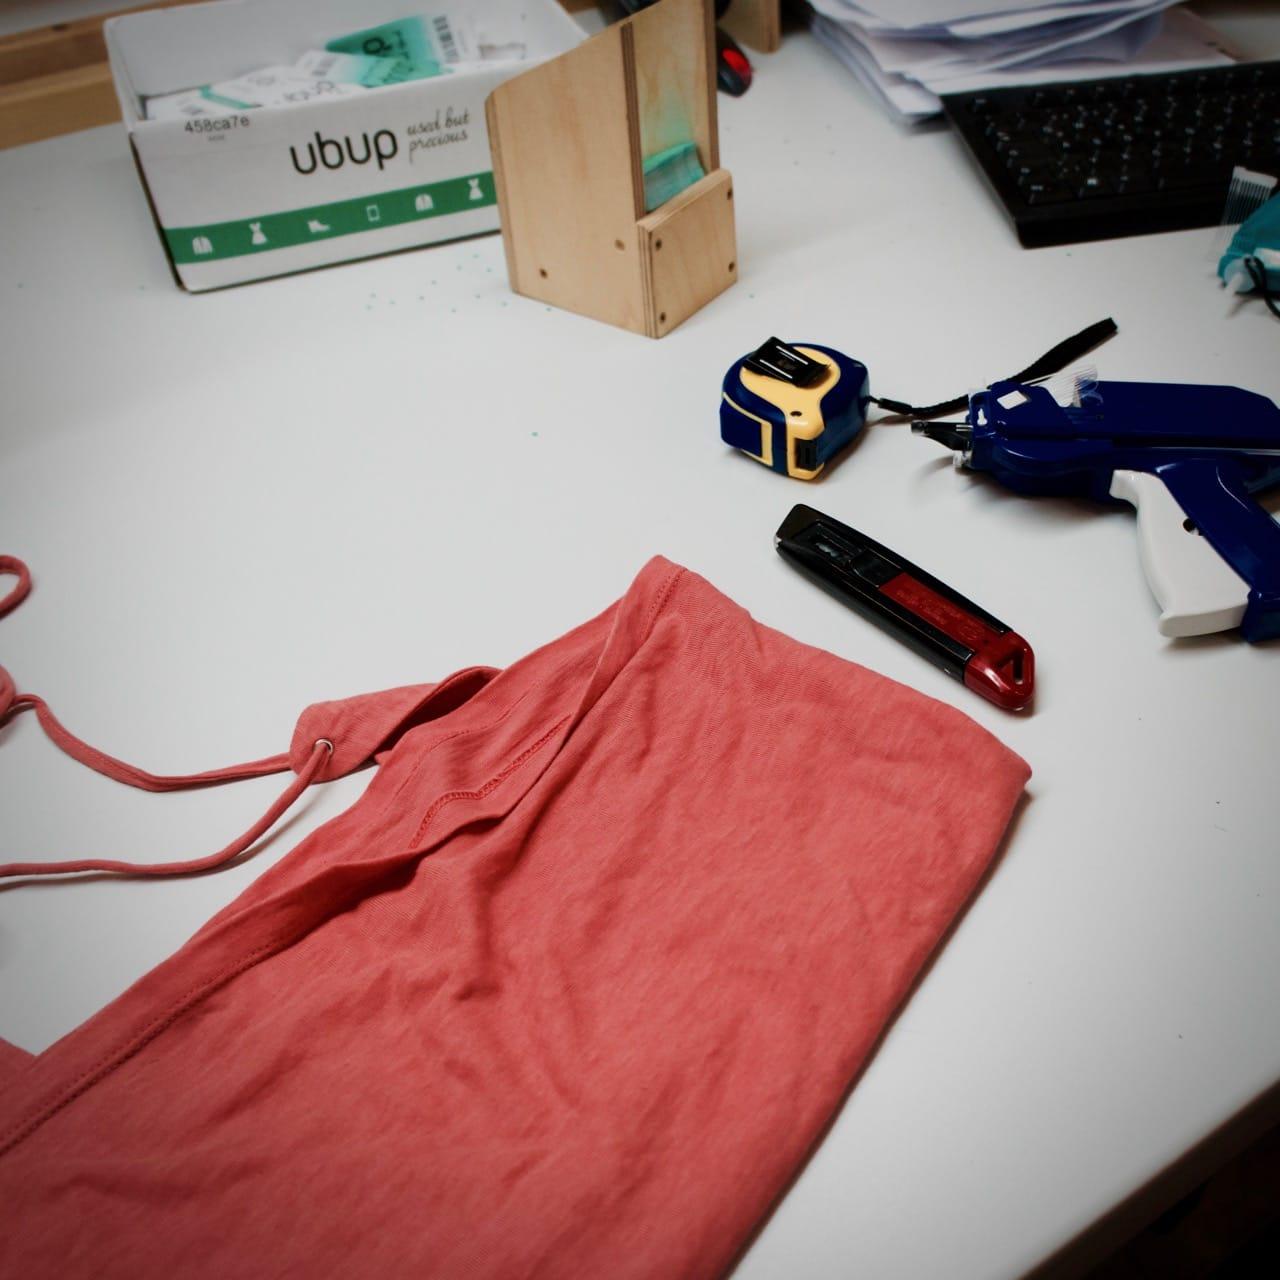 DASISTmomox fashion - Folge mir durch unser Lager 5